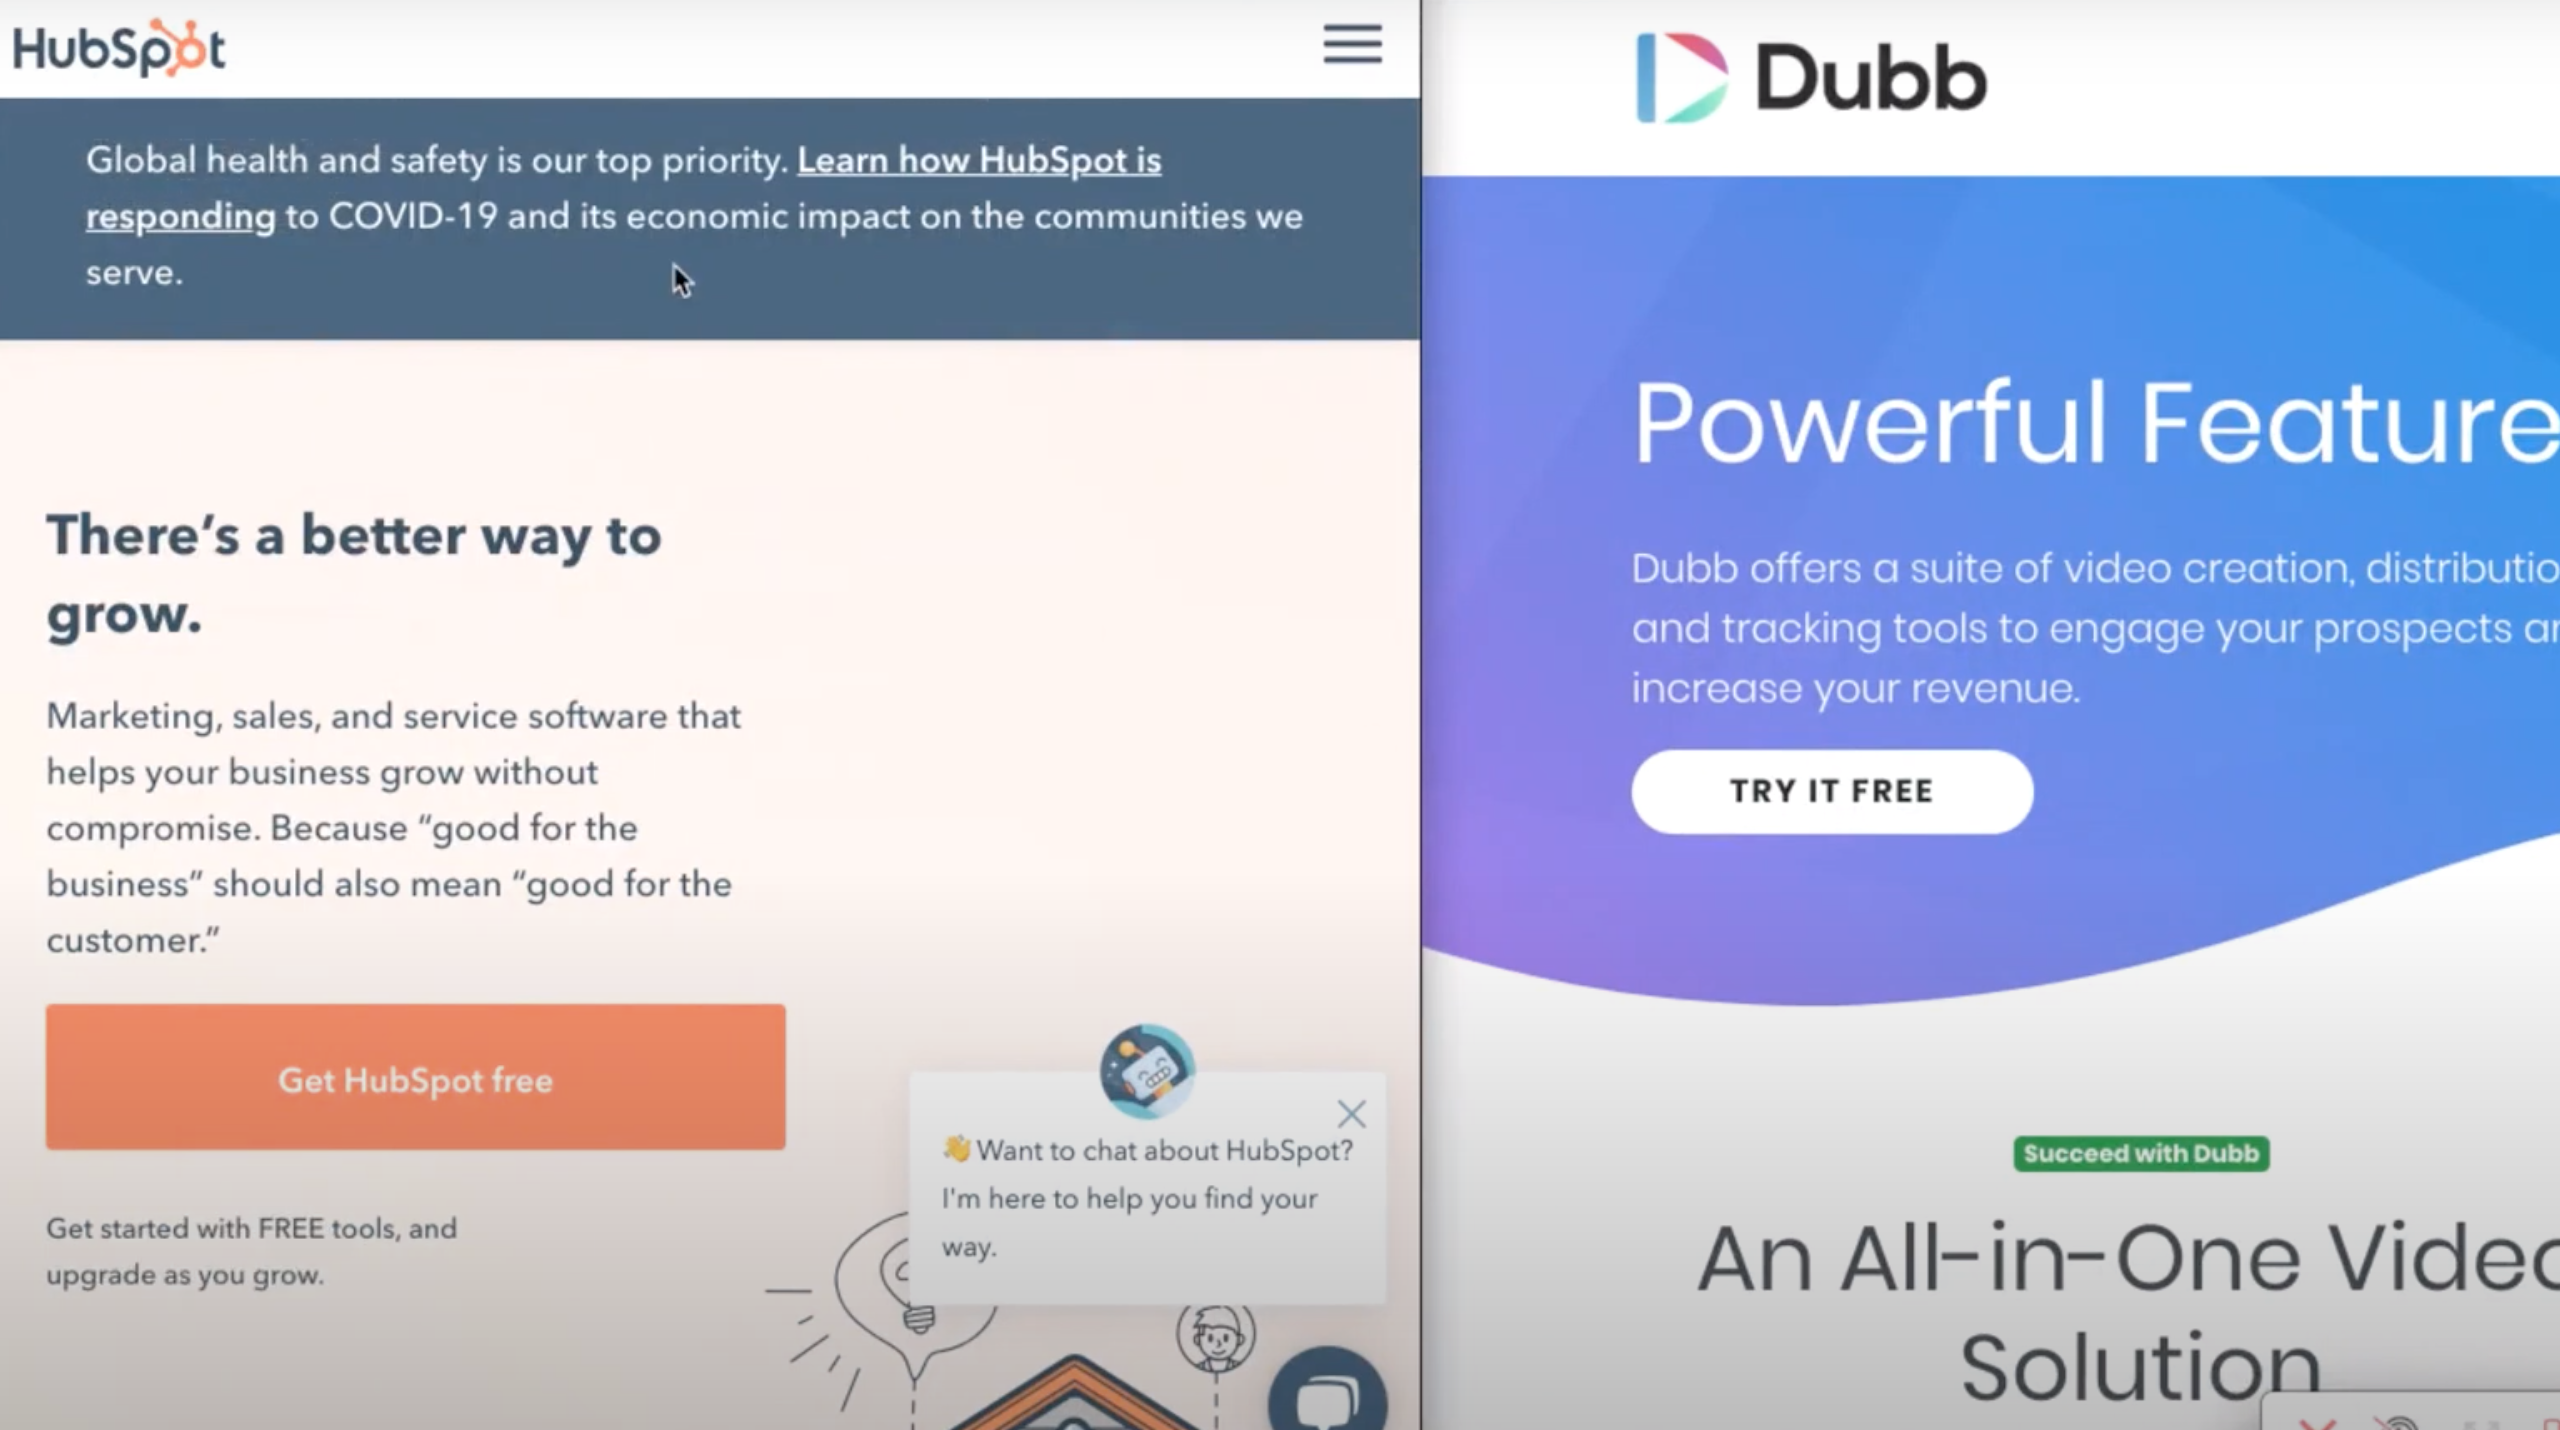 Hubspot website compared to Dubb